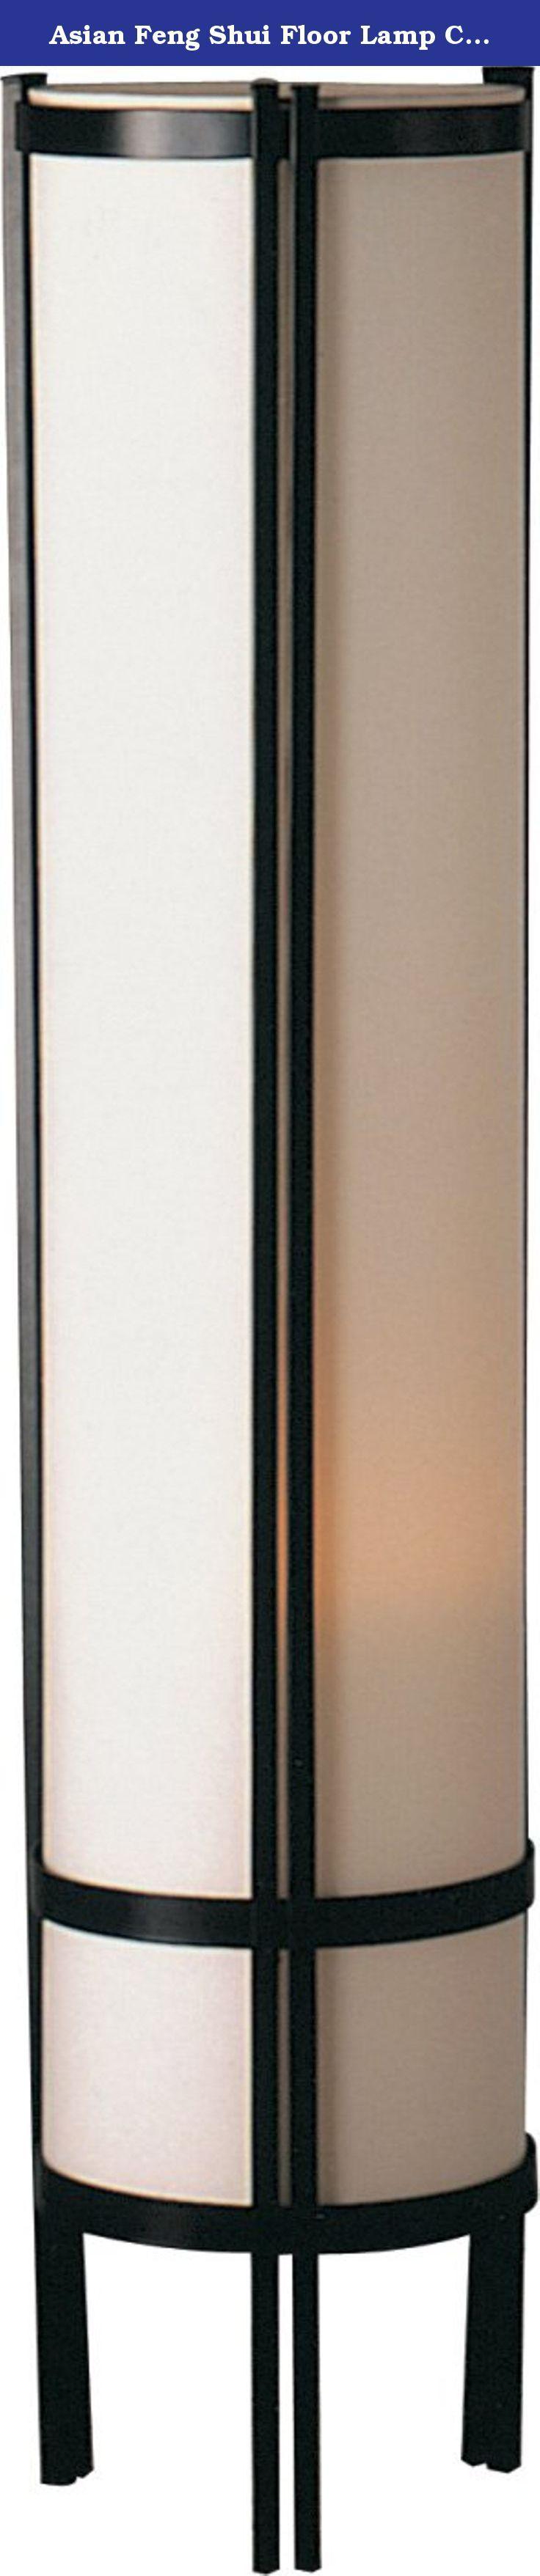 Asian Floor Lamps: Asian Feng Shui Floor Lamp Contemporary Modern Linen Shade 2029F. Asian  Feng Shui Floor Lamp,Lighting